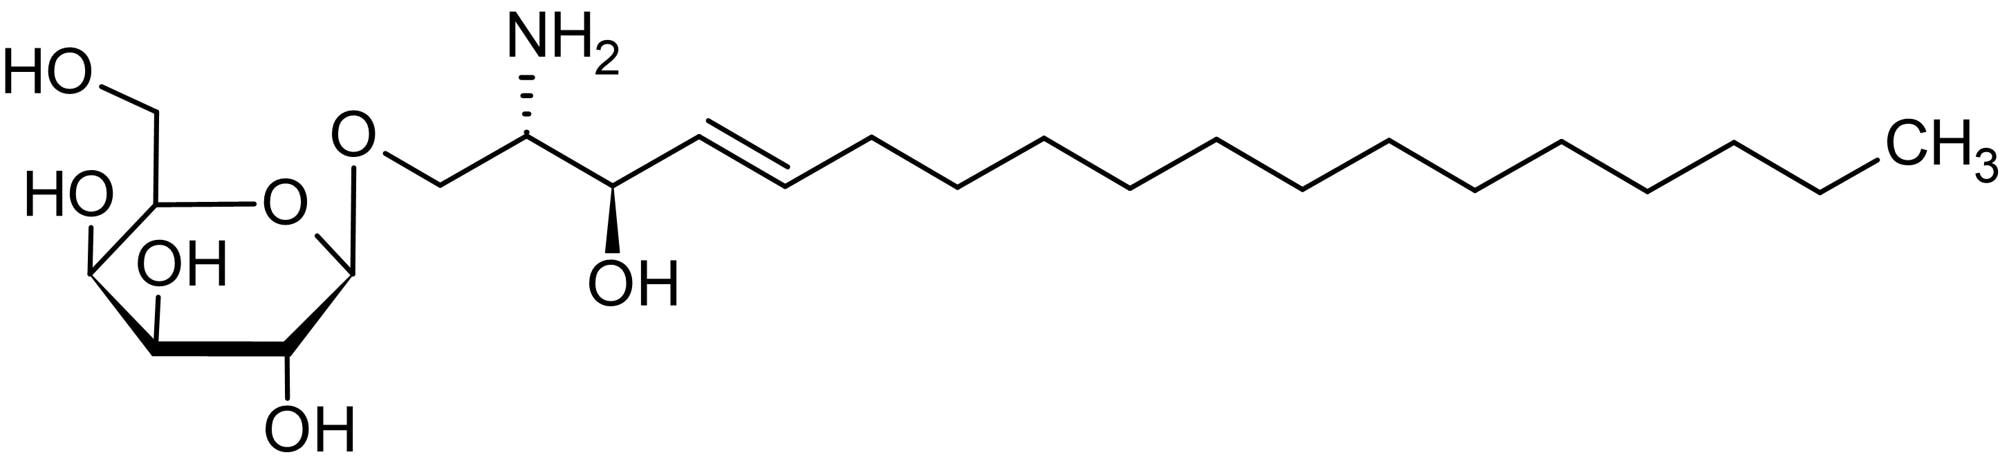 Chemical Structure - Psychosine (Galactosylsphingosine), Cationic lysosphingolipid (ab143930)